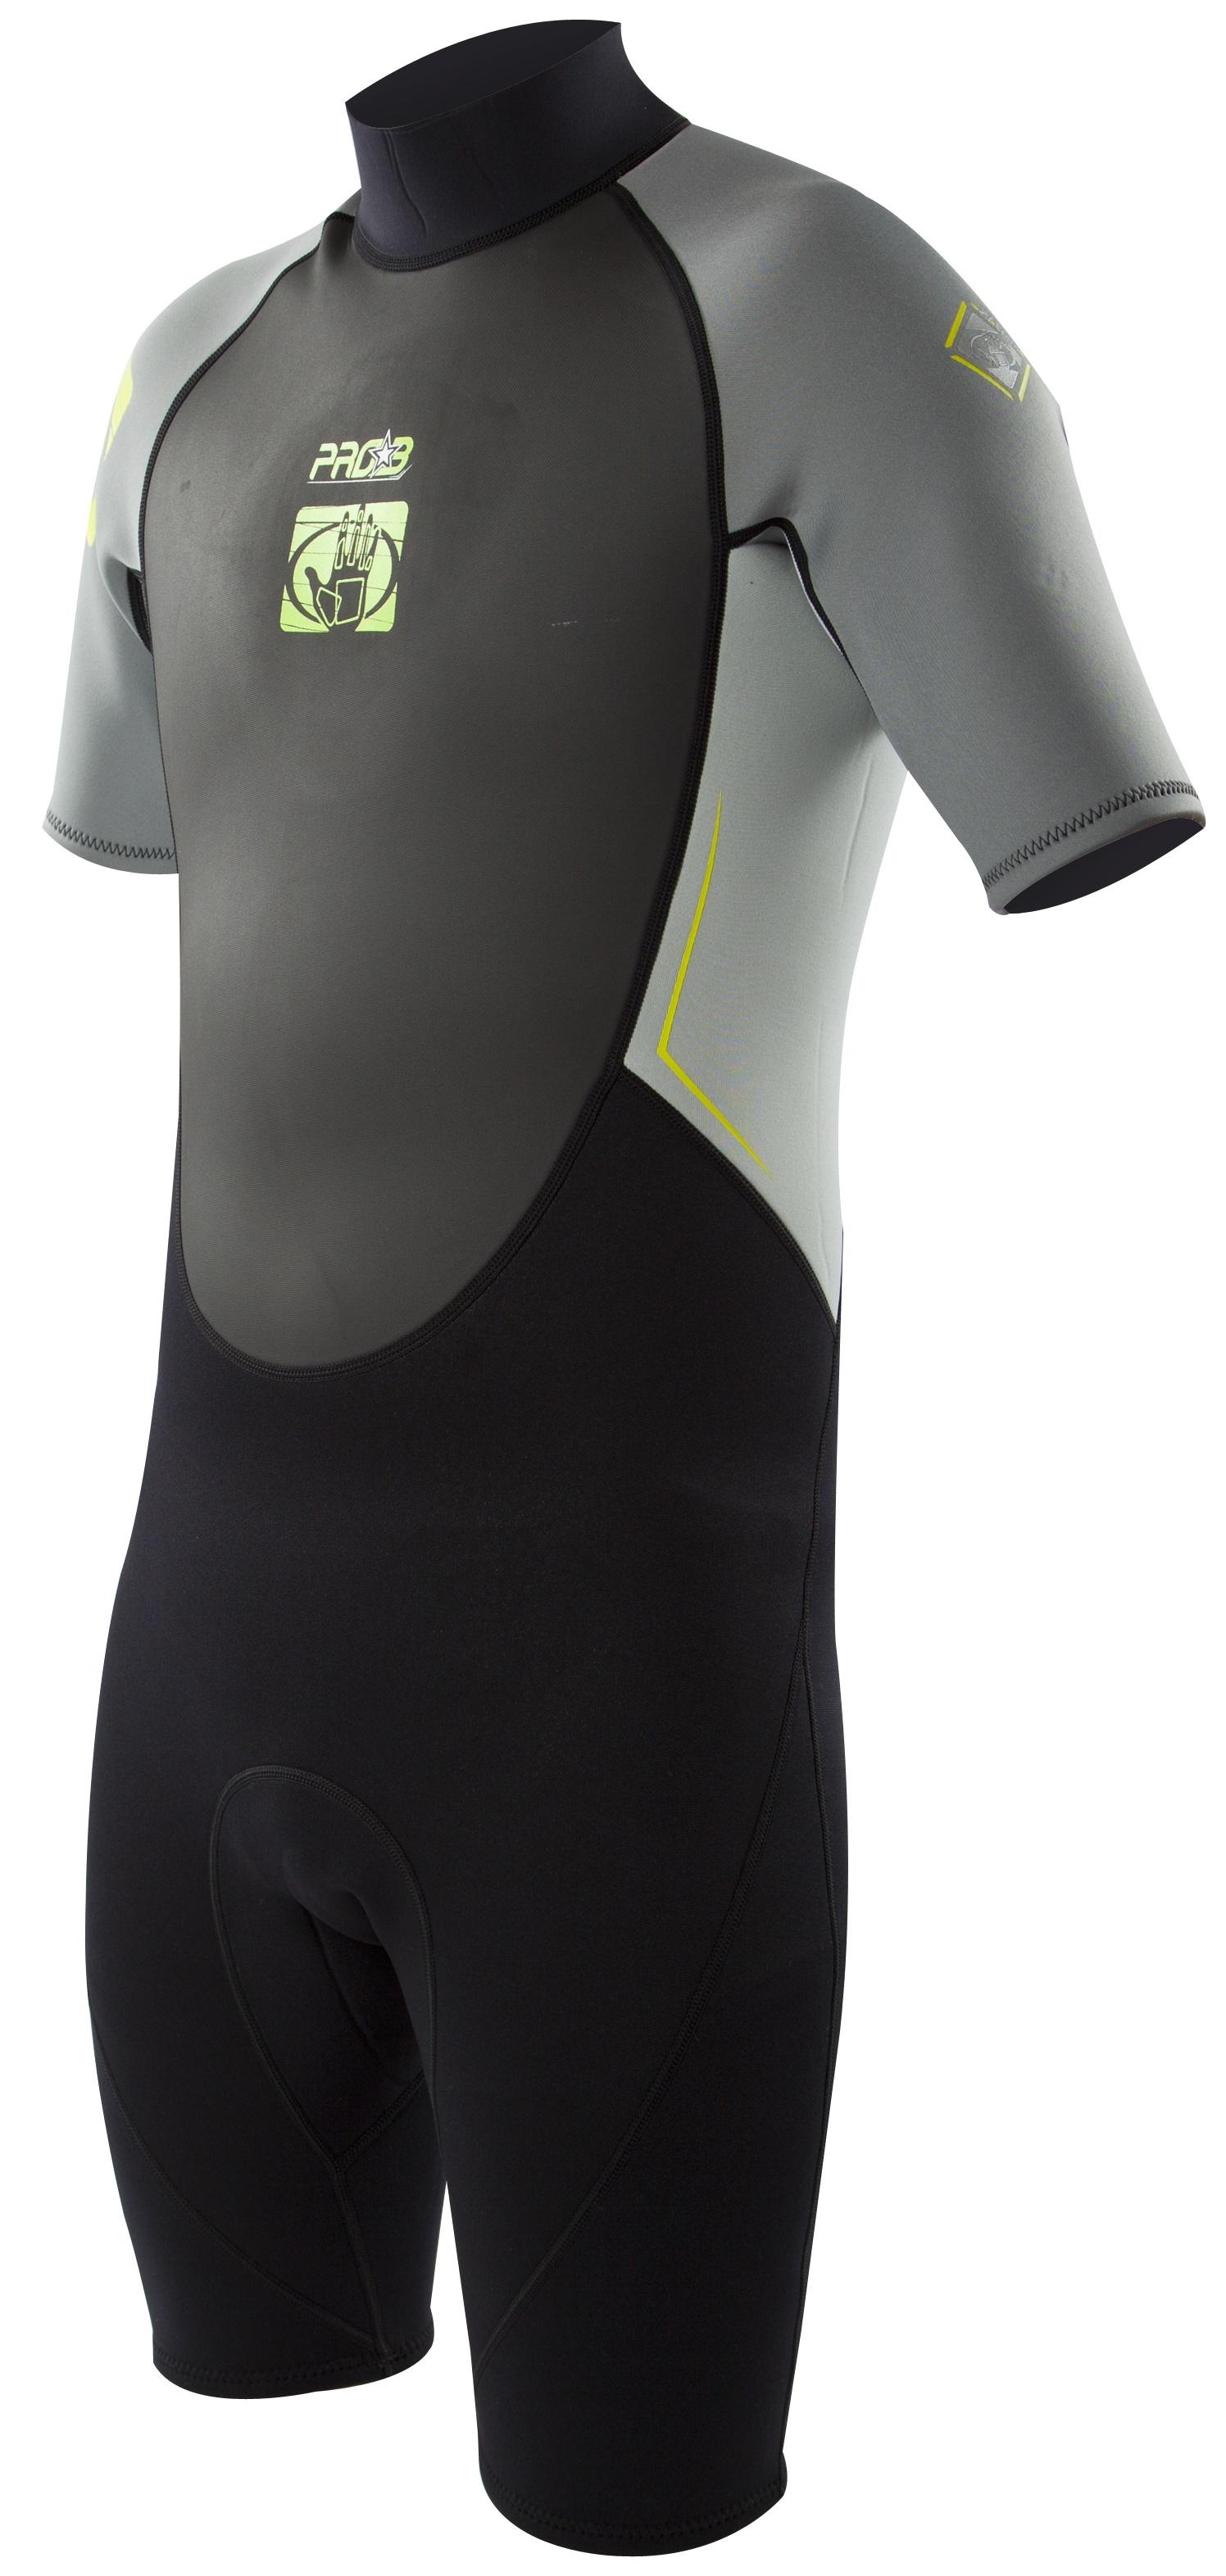 Body Glove Men S Pro3 Springsuit Wetsuit 2 1mm Black